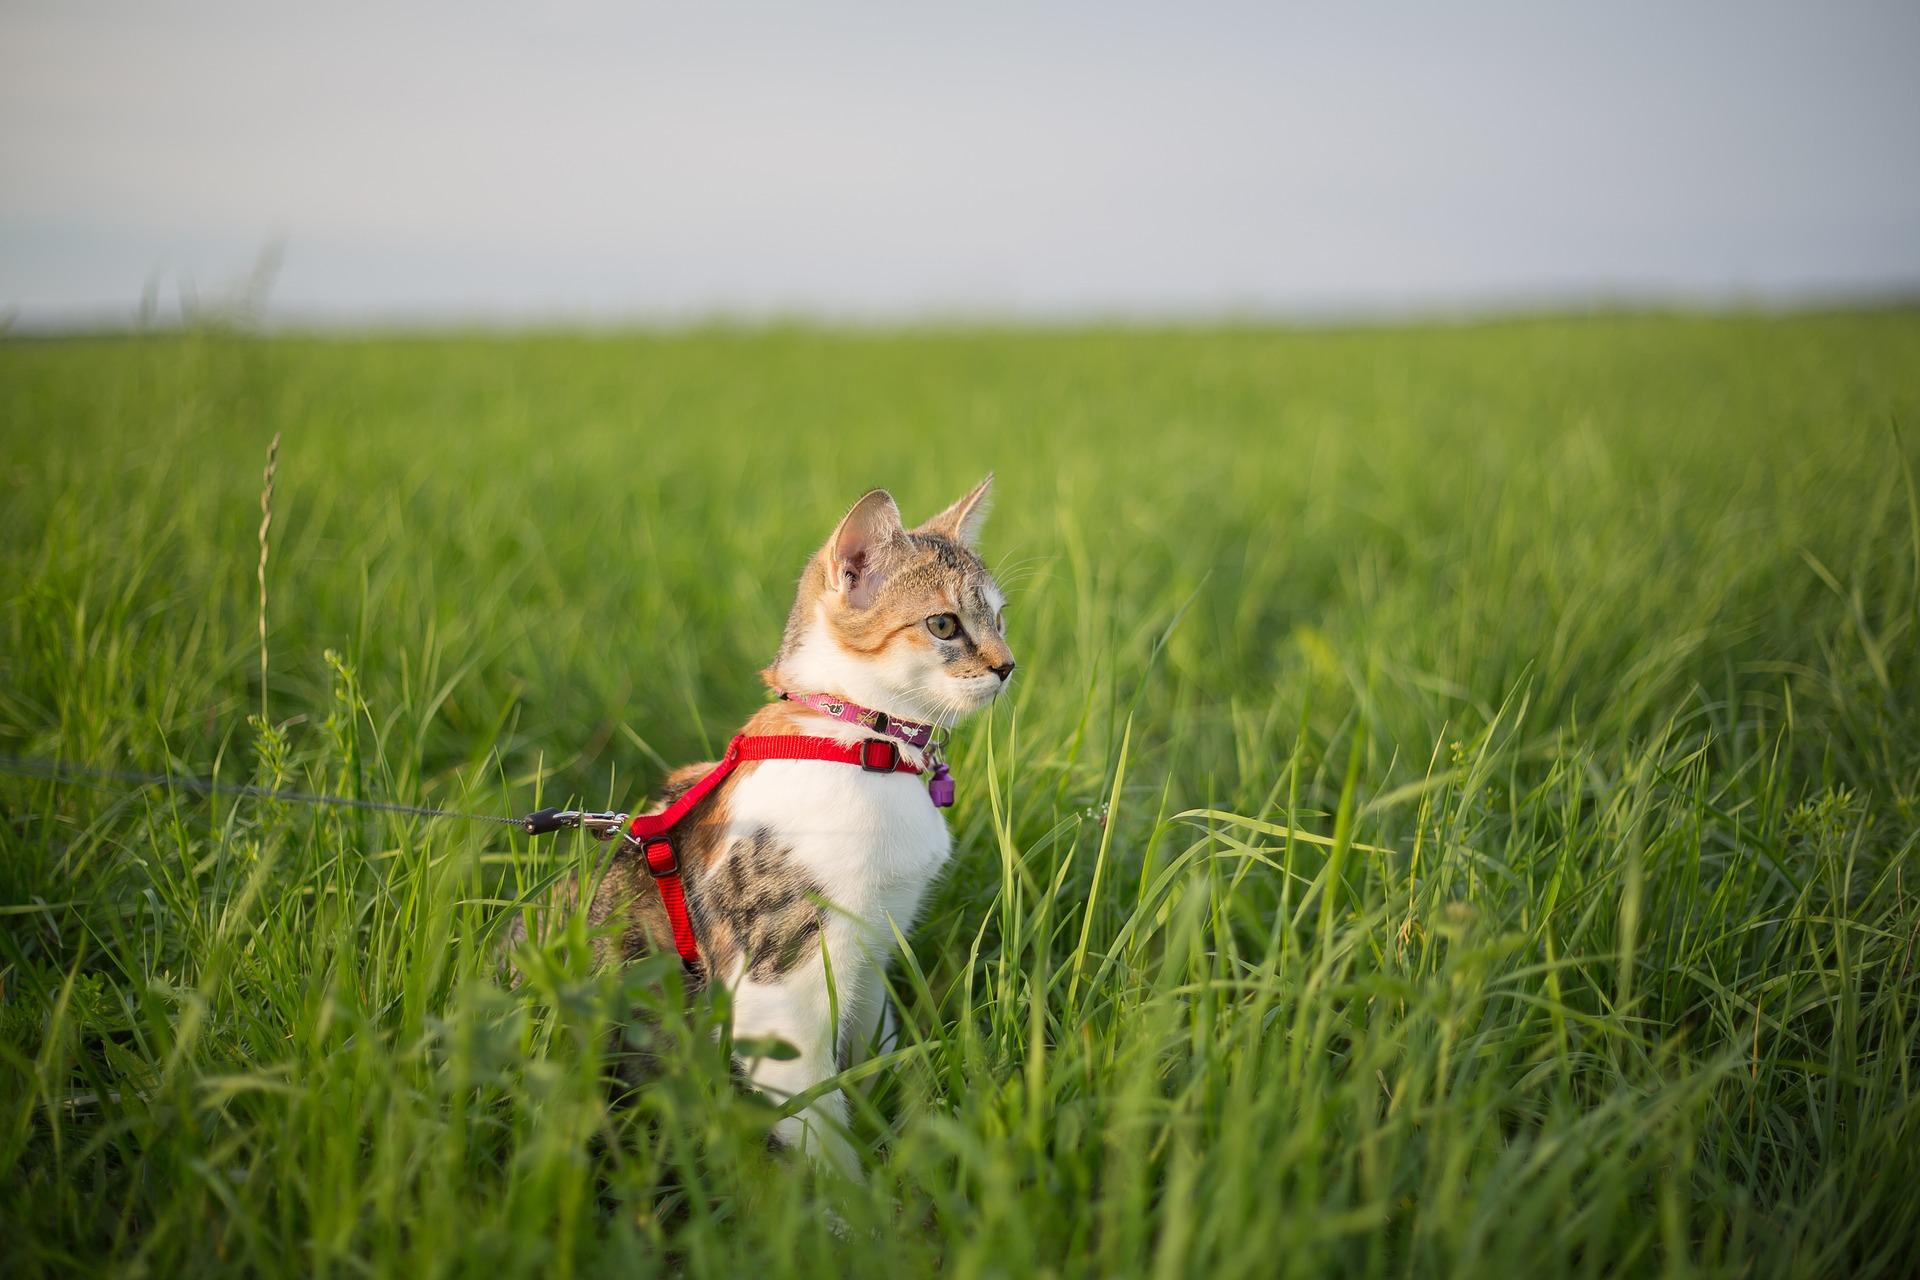 Cat on a Leash in a Field